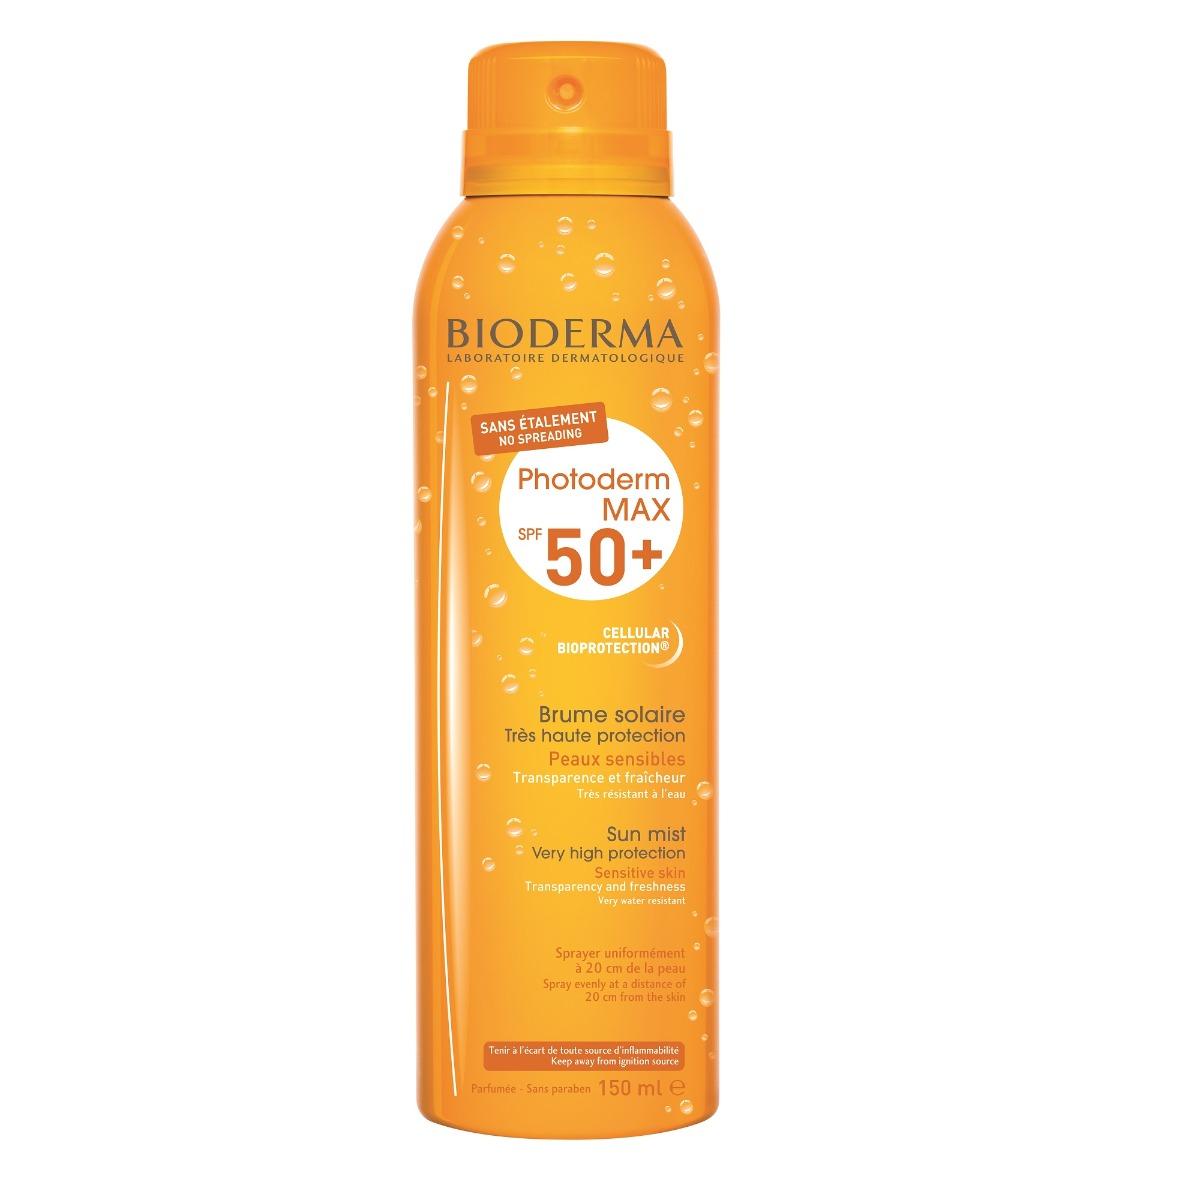 Spray protectie solara SPF 50+ Photoderm MAX Brume, 150ml, Bioderma drmax.ro